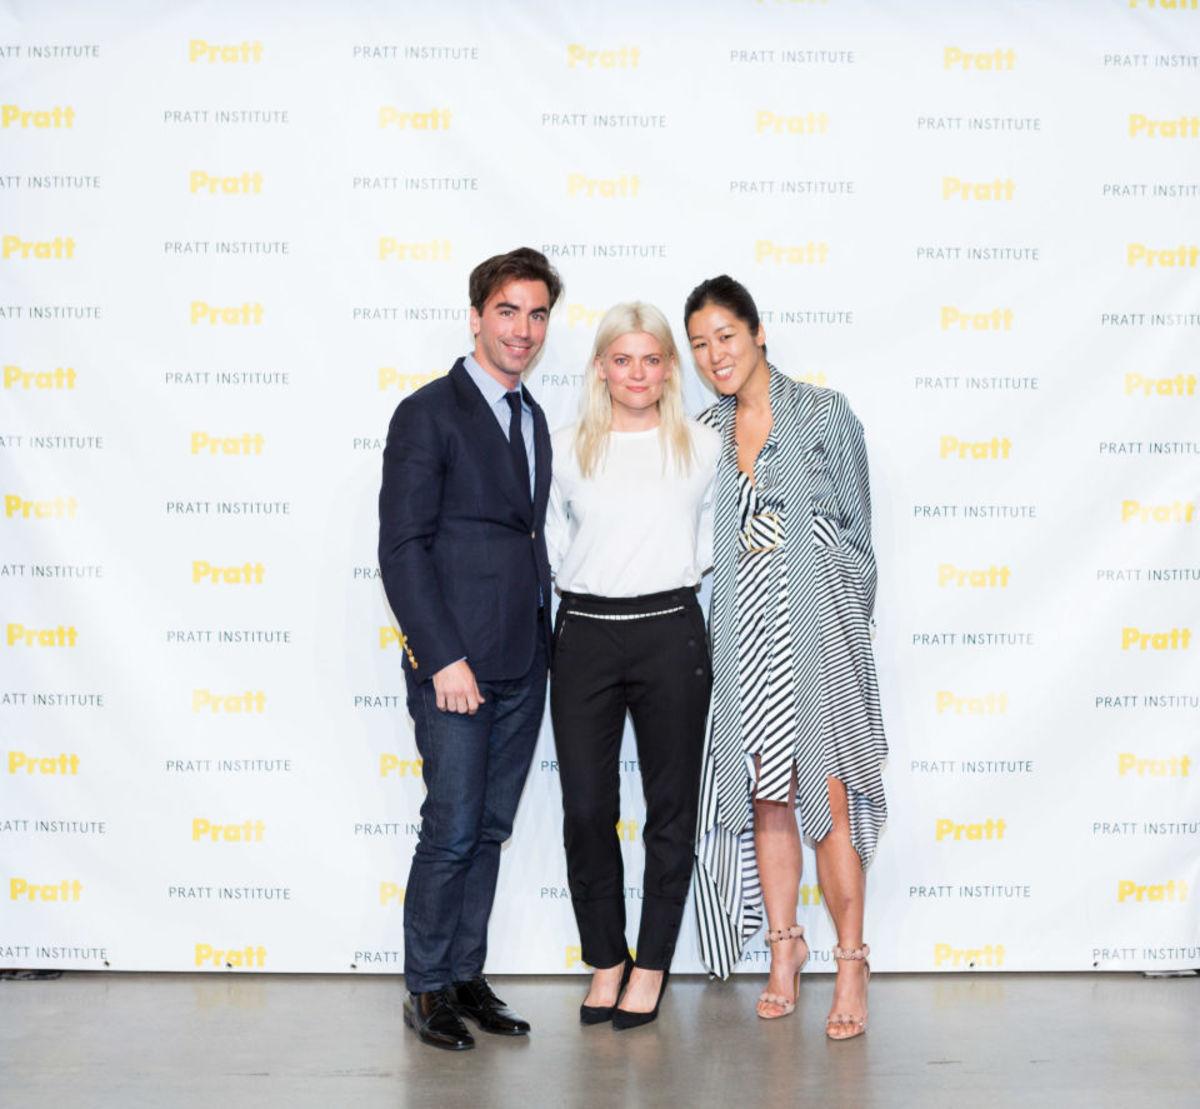 Fernando Garcia, Kate Young and Laura Kim at the 2017 Pratt Fashion Show. Photo: Daniel Terna/Pratt Institute